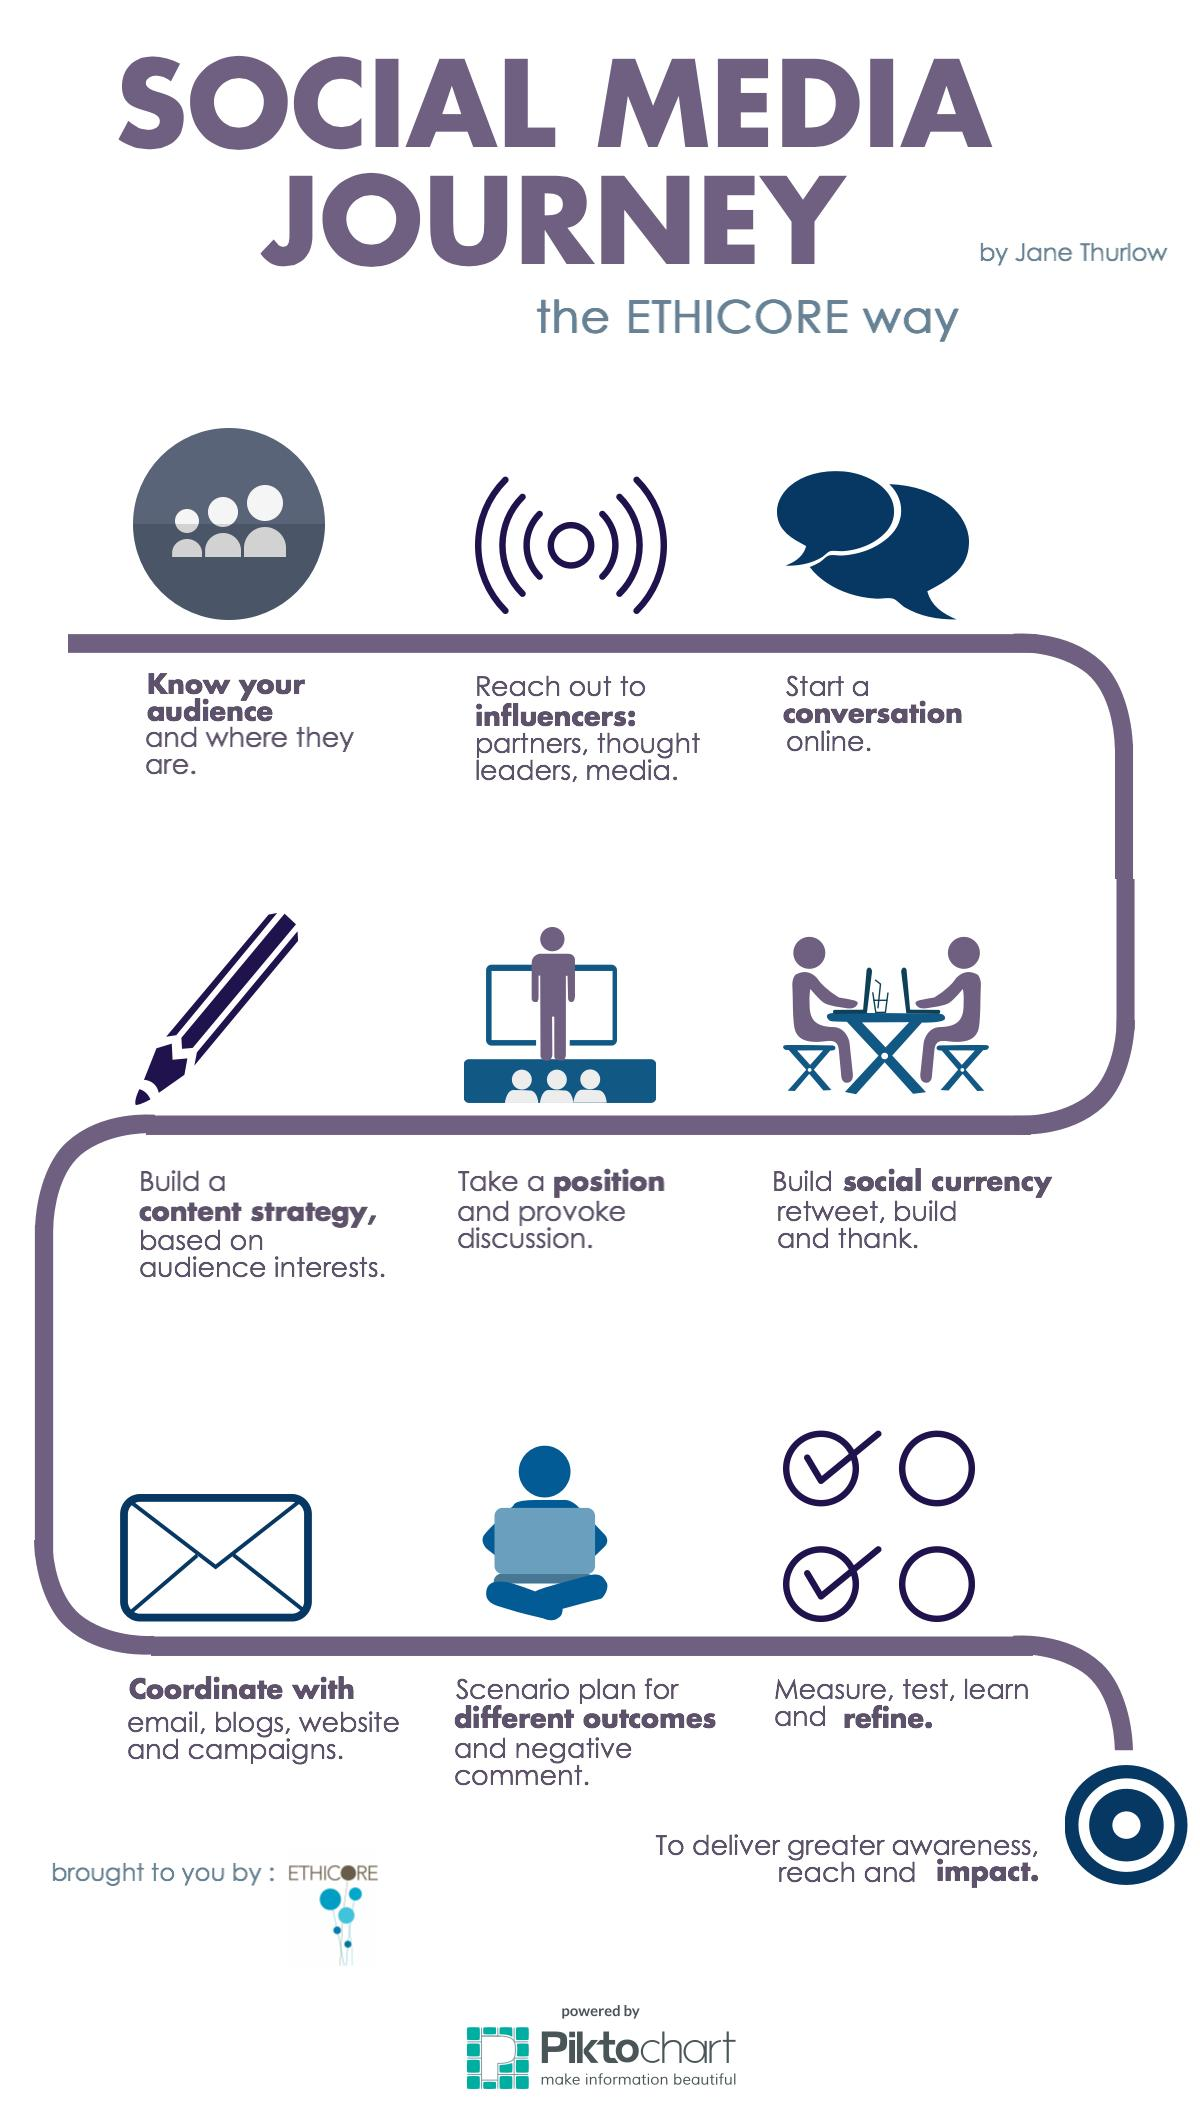 Social Media Journey-The Ethicore Way